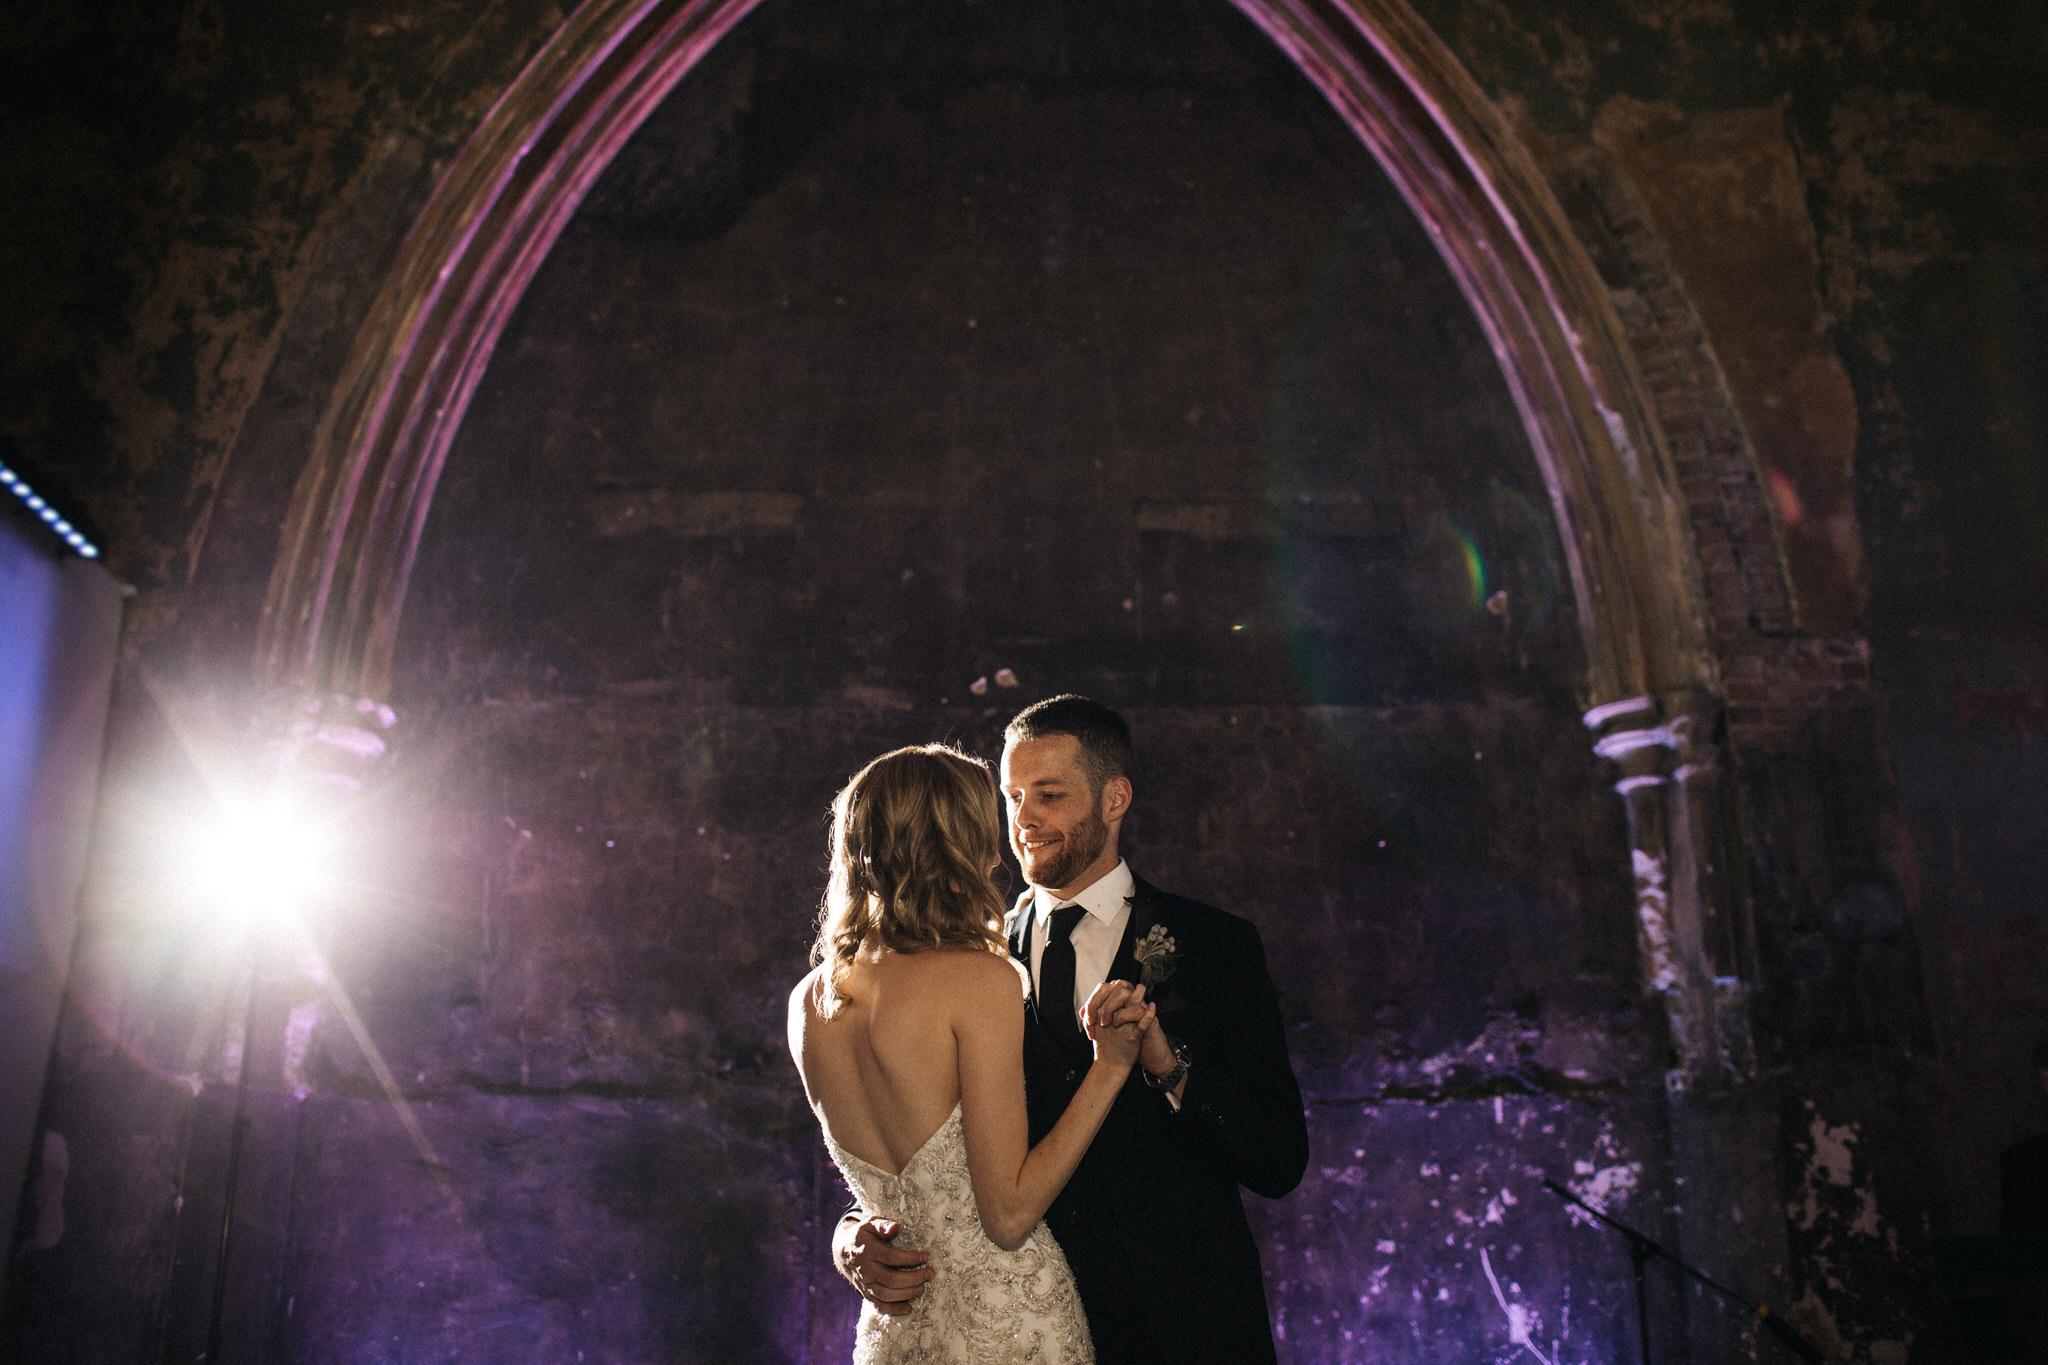 guest photos, berkeley church wedding, bridal portraits, toronto wedding photographer, berkeley field house, bride and groom first dance